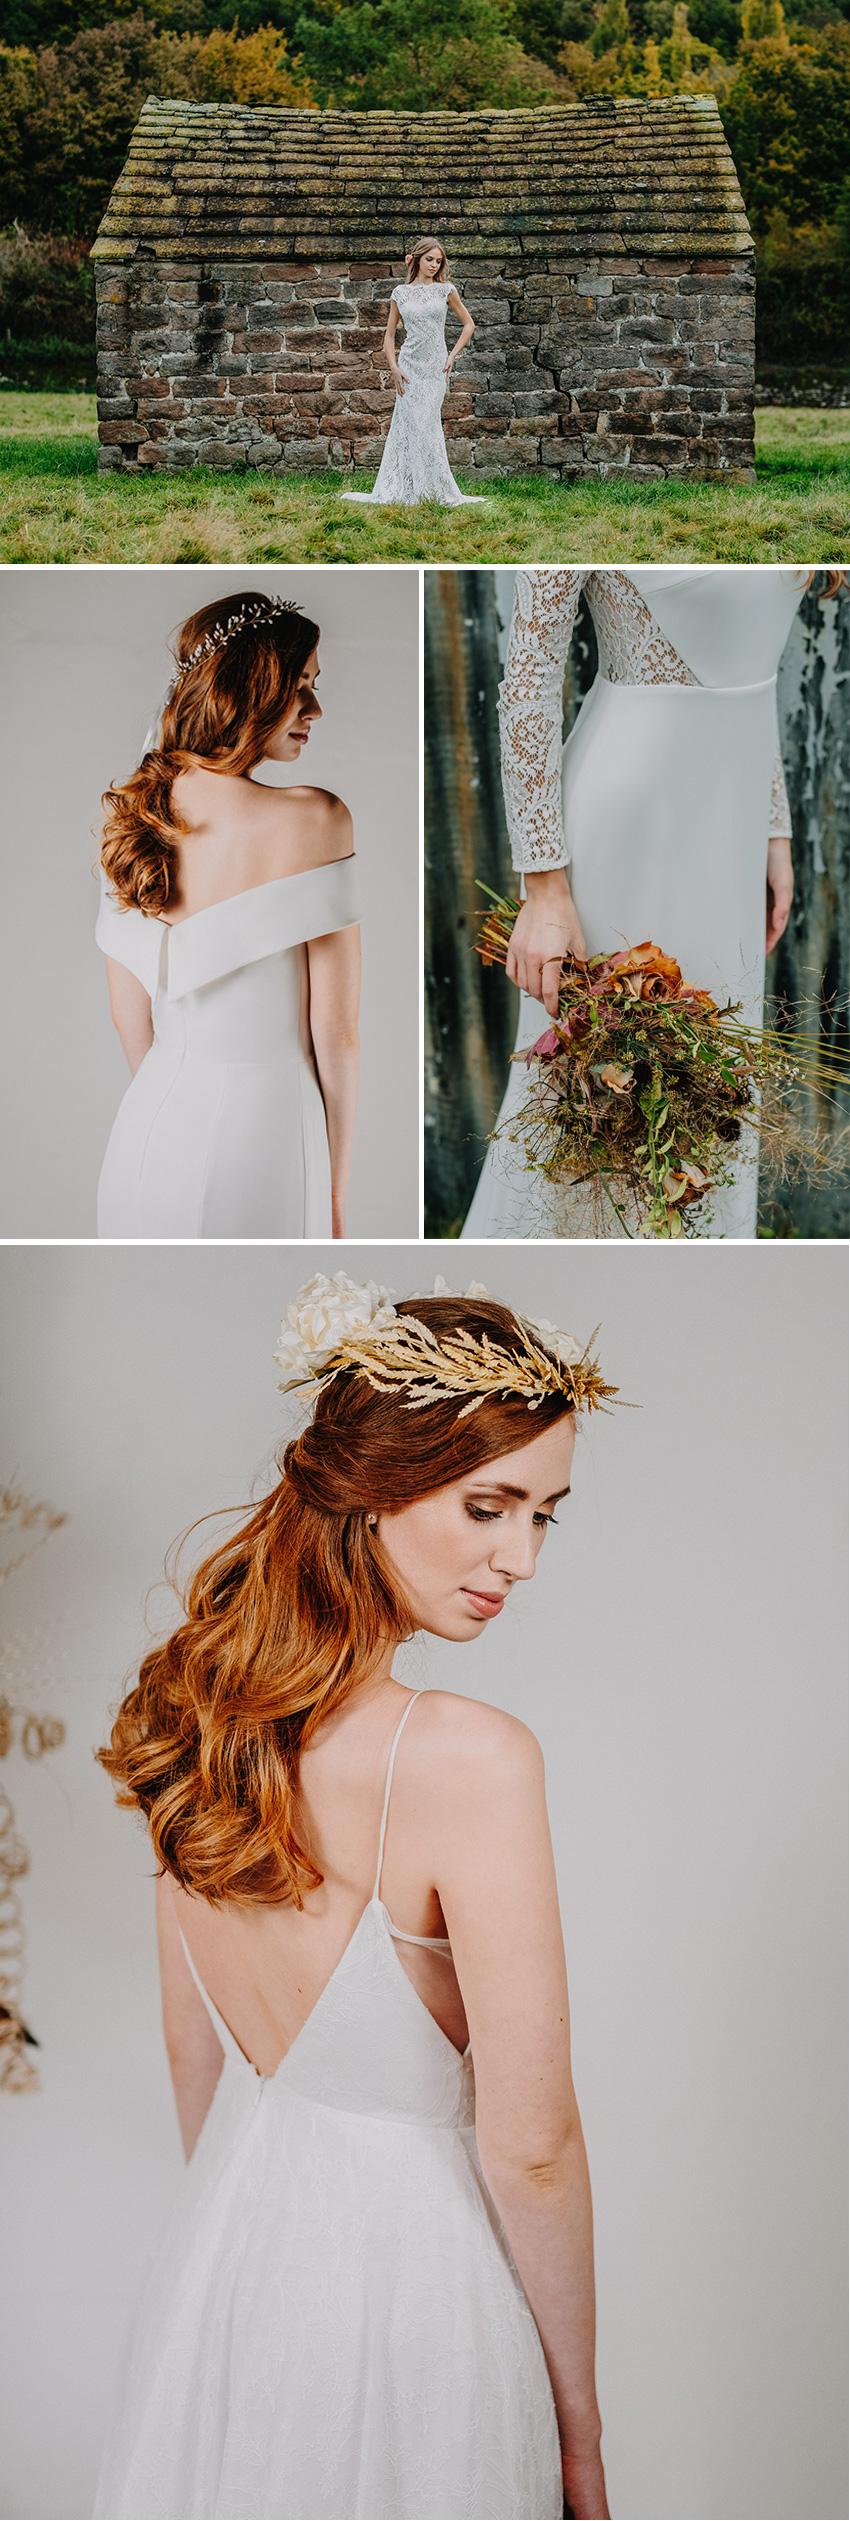 Australian wedding dress designer Wendy Makin's French bridal collection featured in Perfect Wedding Magazine